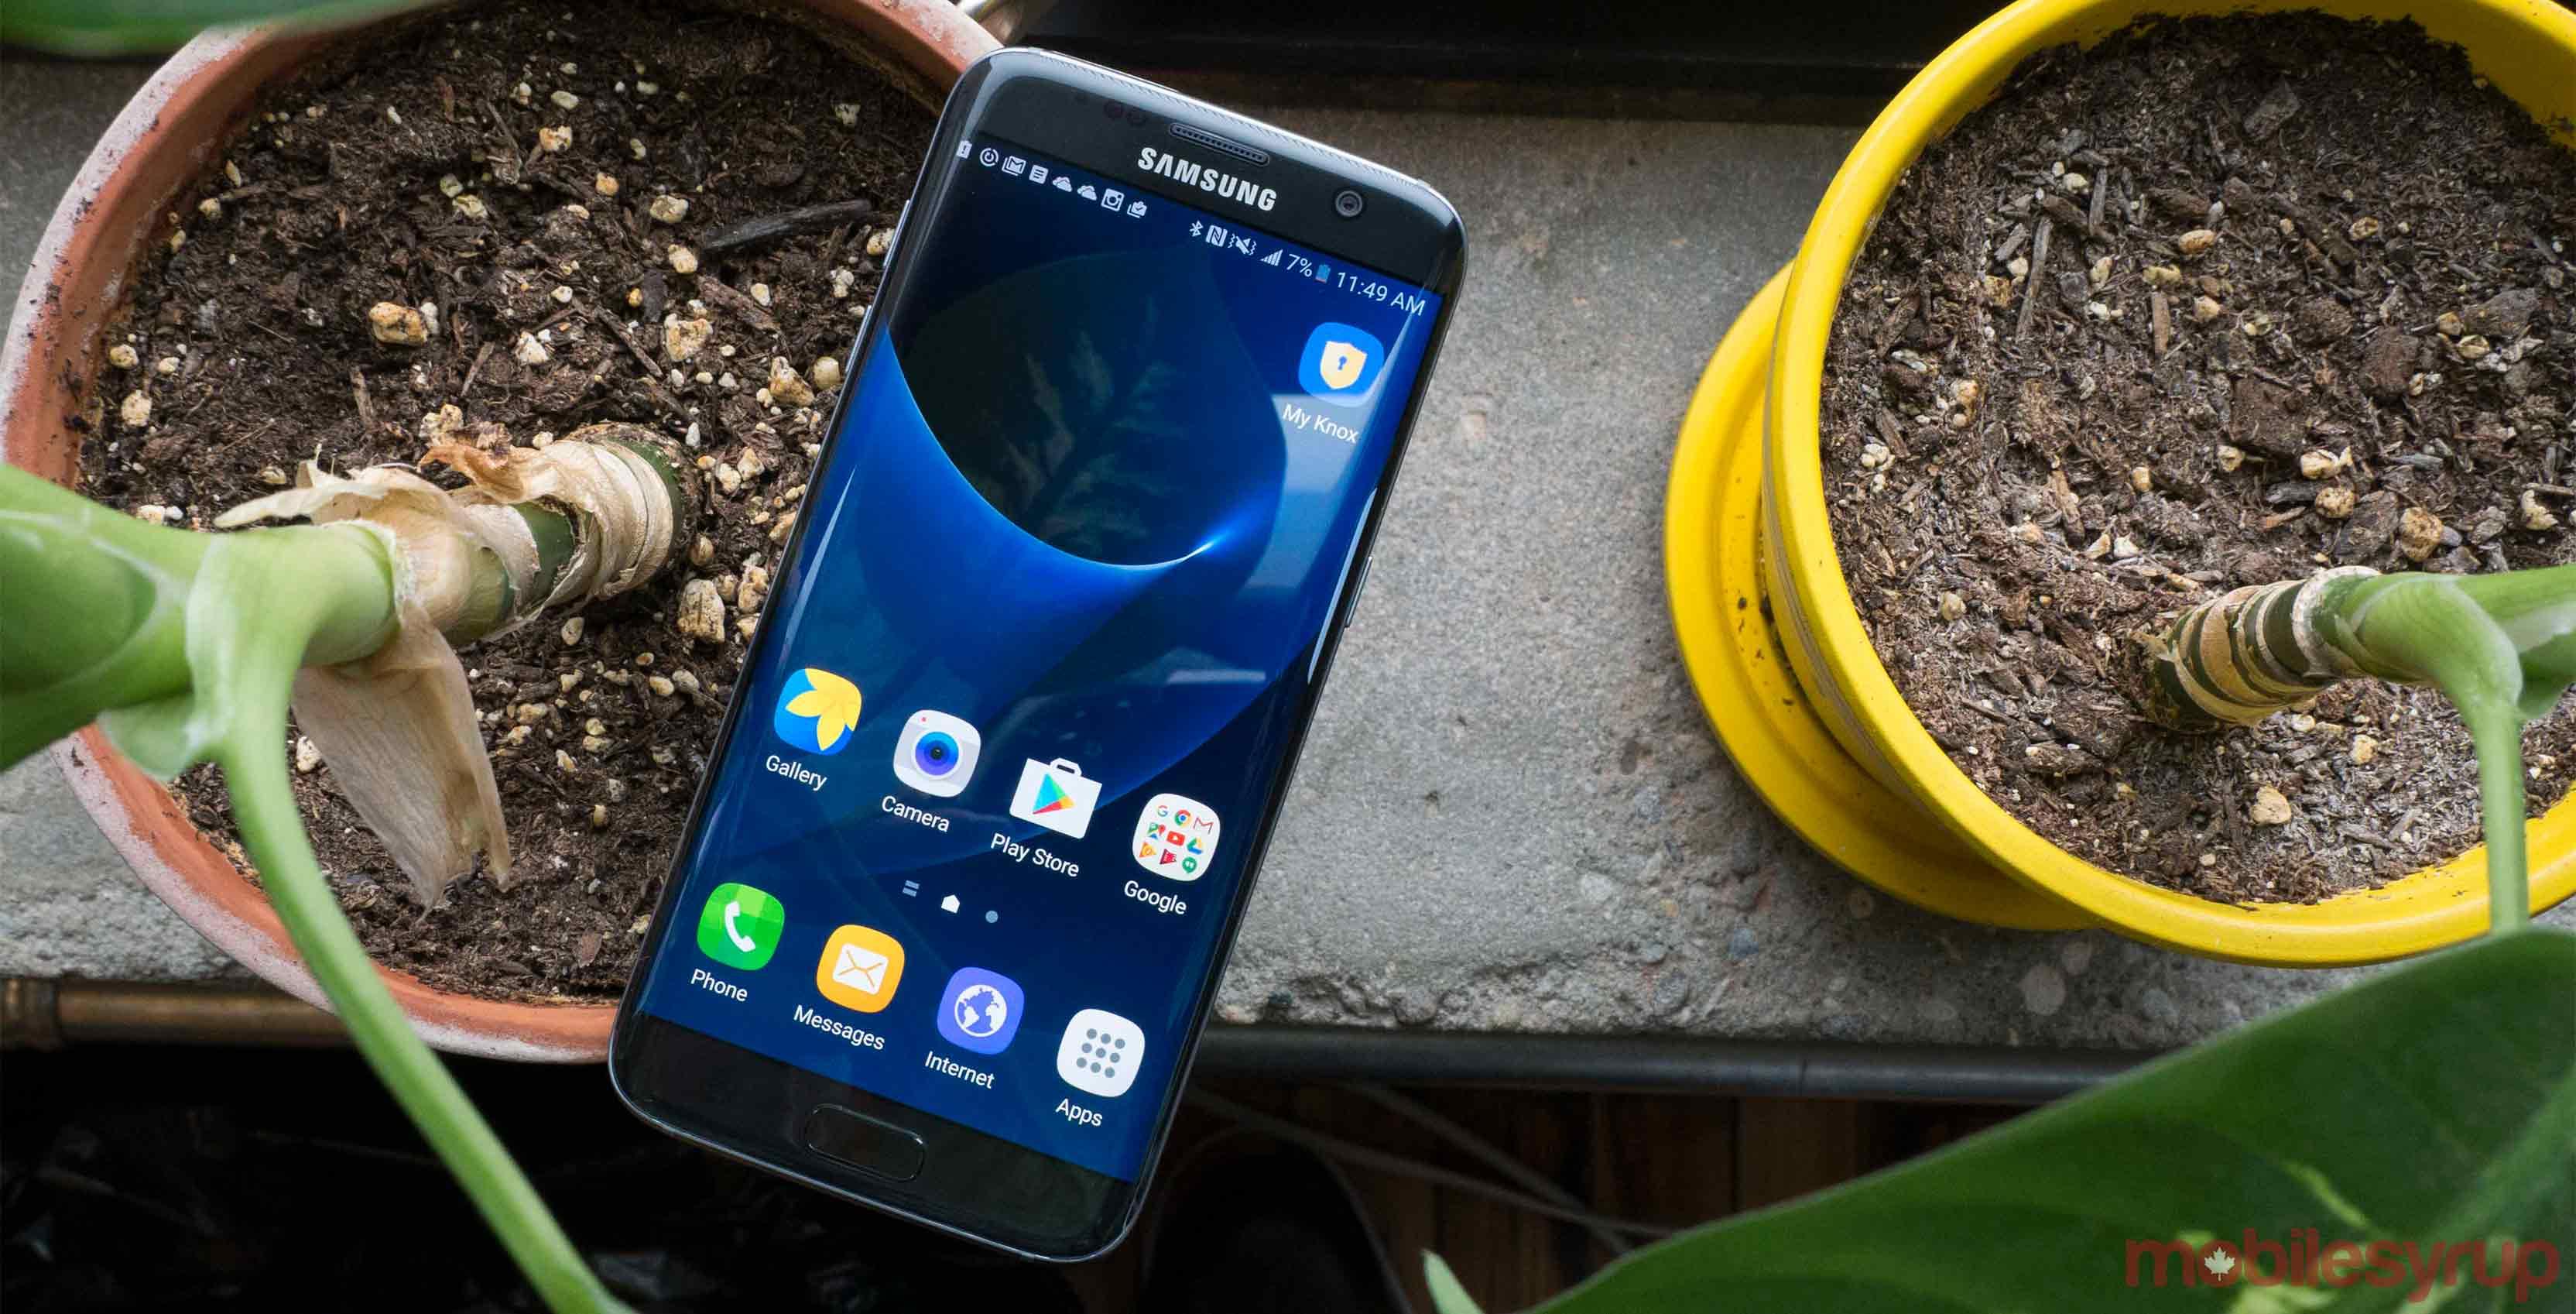 samsung s7 on table - Galaxy S8+